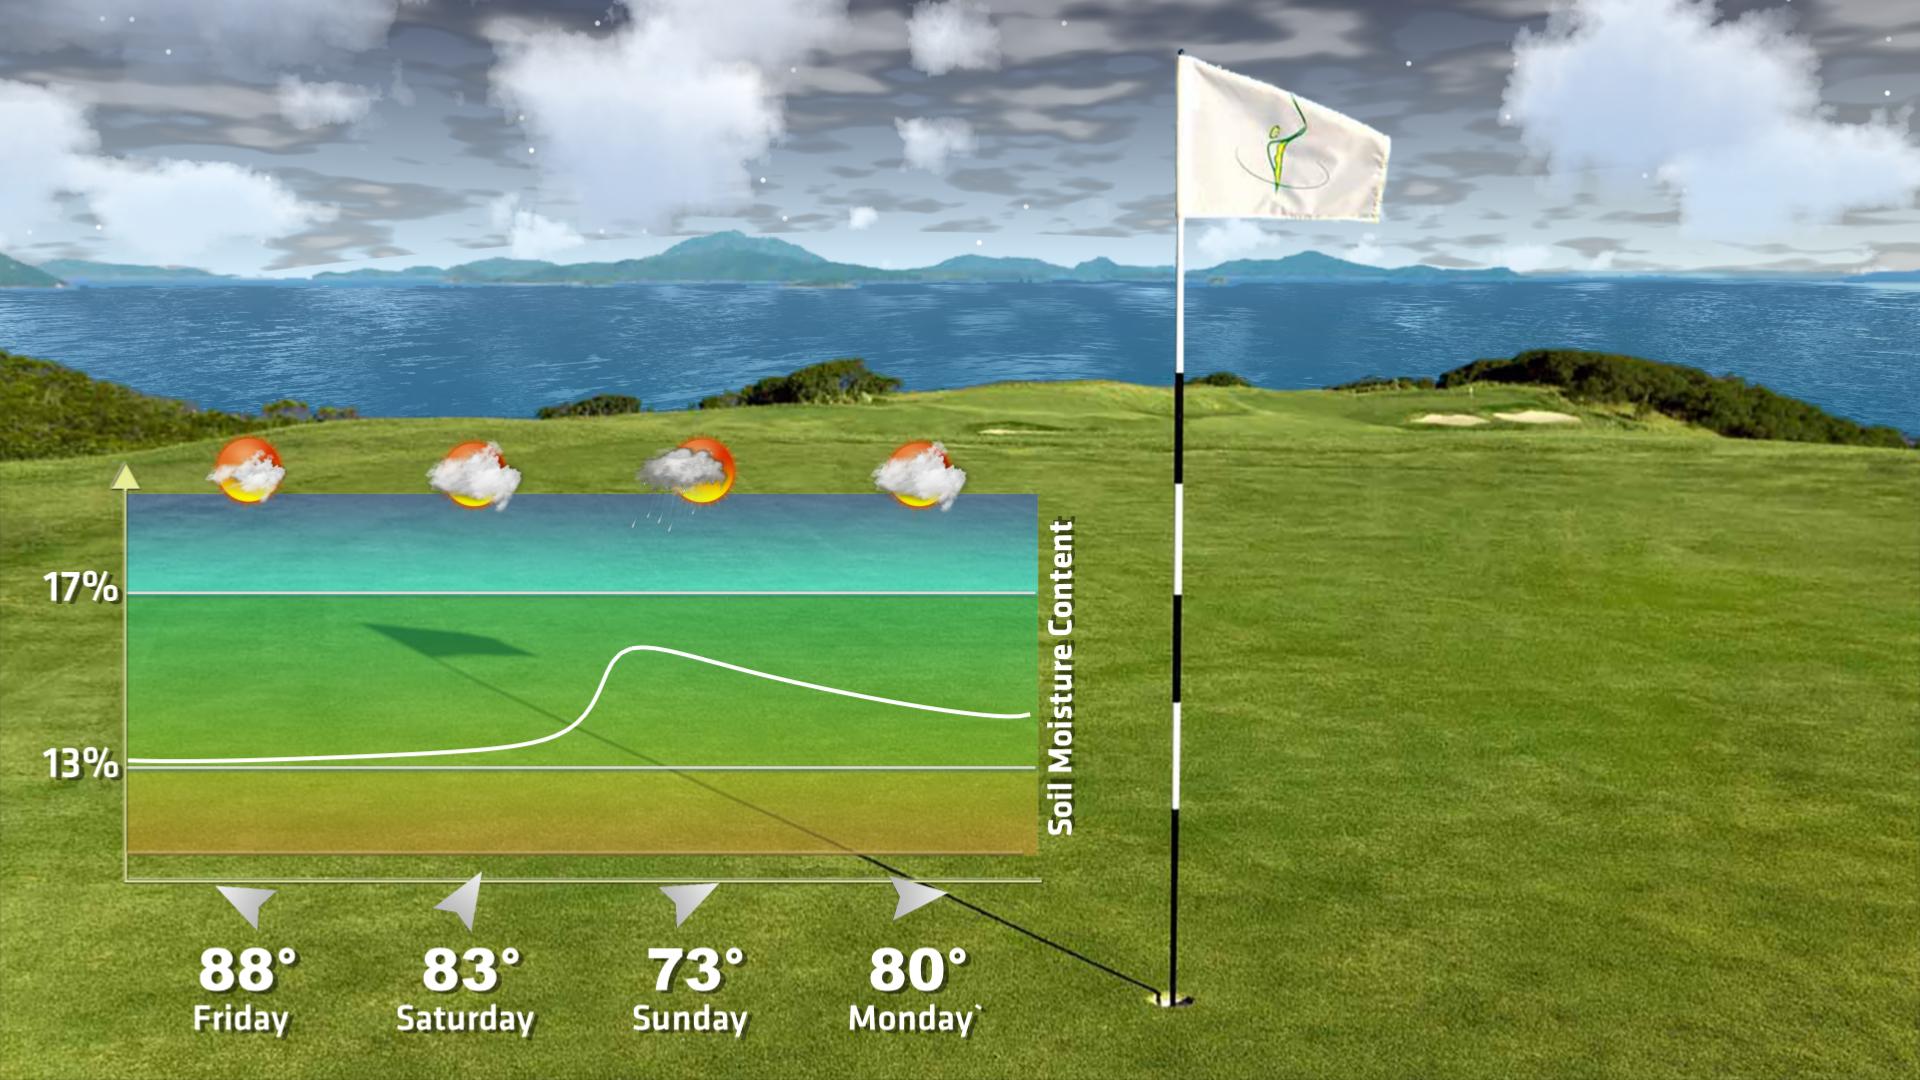 SoilMoisture_GolfCourse_forecast.png